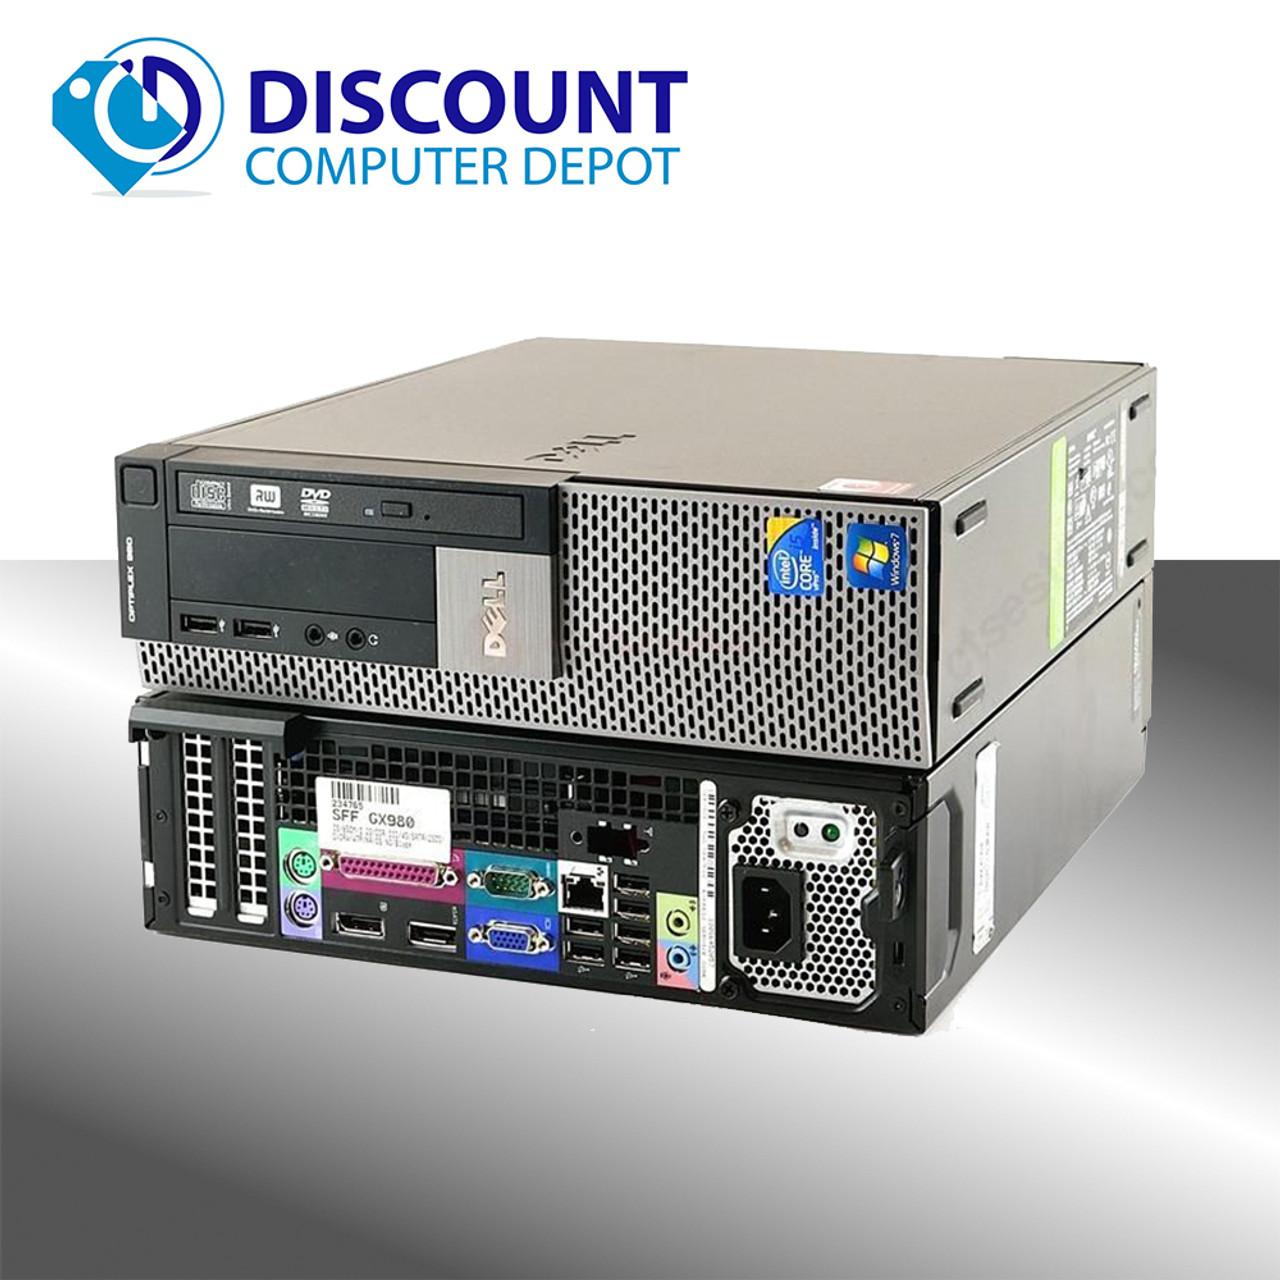 Dell Optiplex 980 Desktop Computer I5-660 3 3GHz 4GB 500GB Windows 10 Home  WiFi